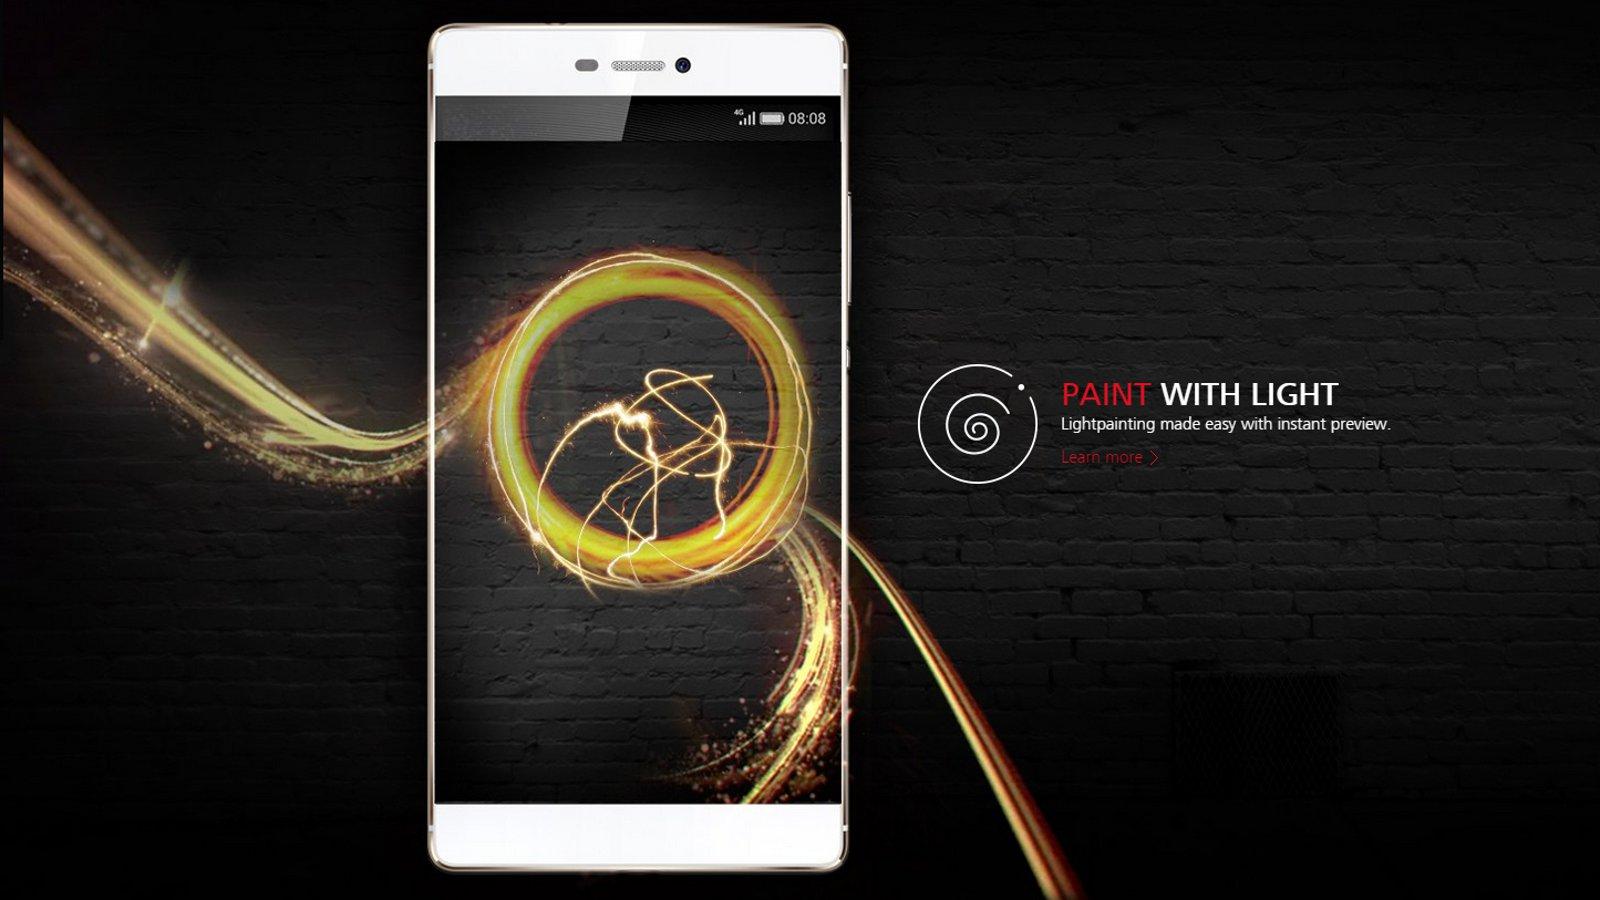 Huawei P8 Promo